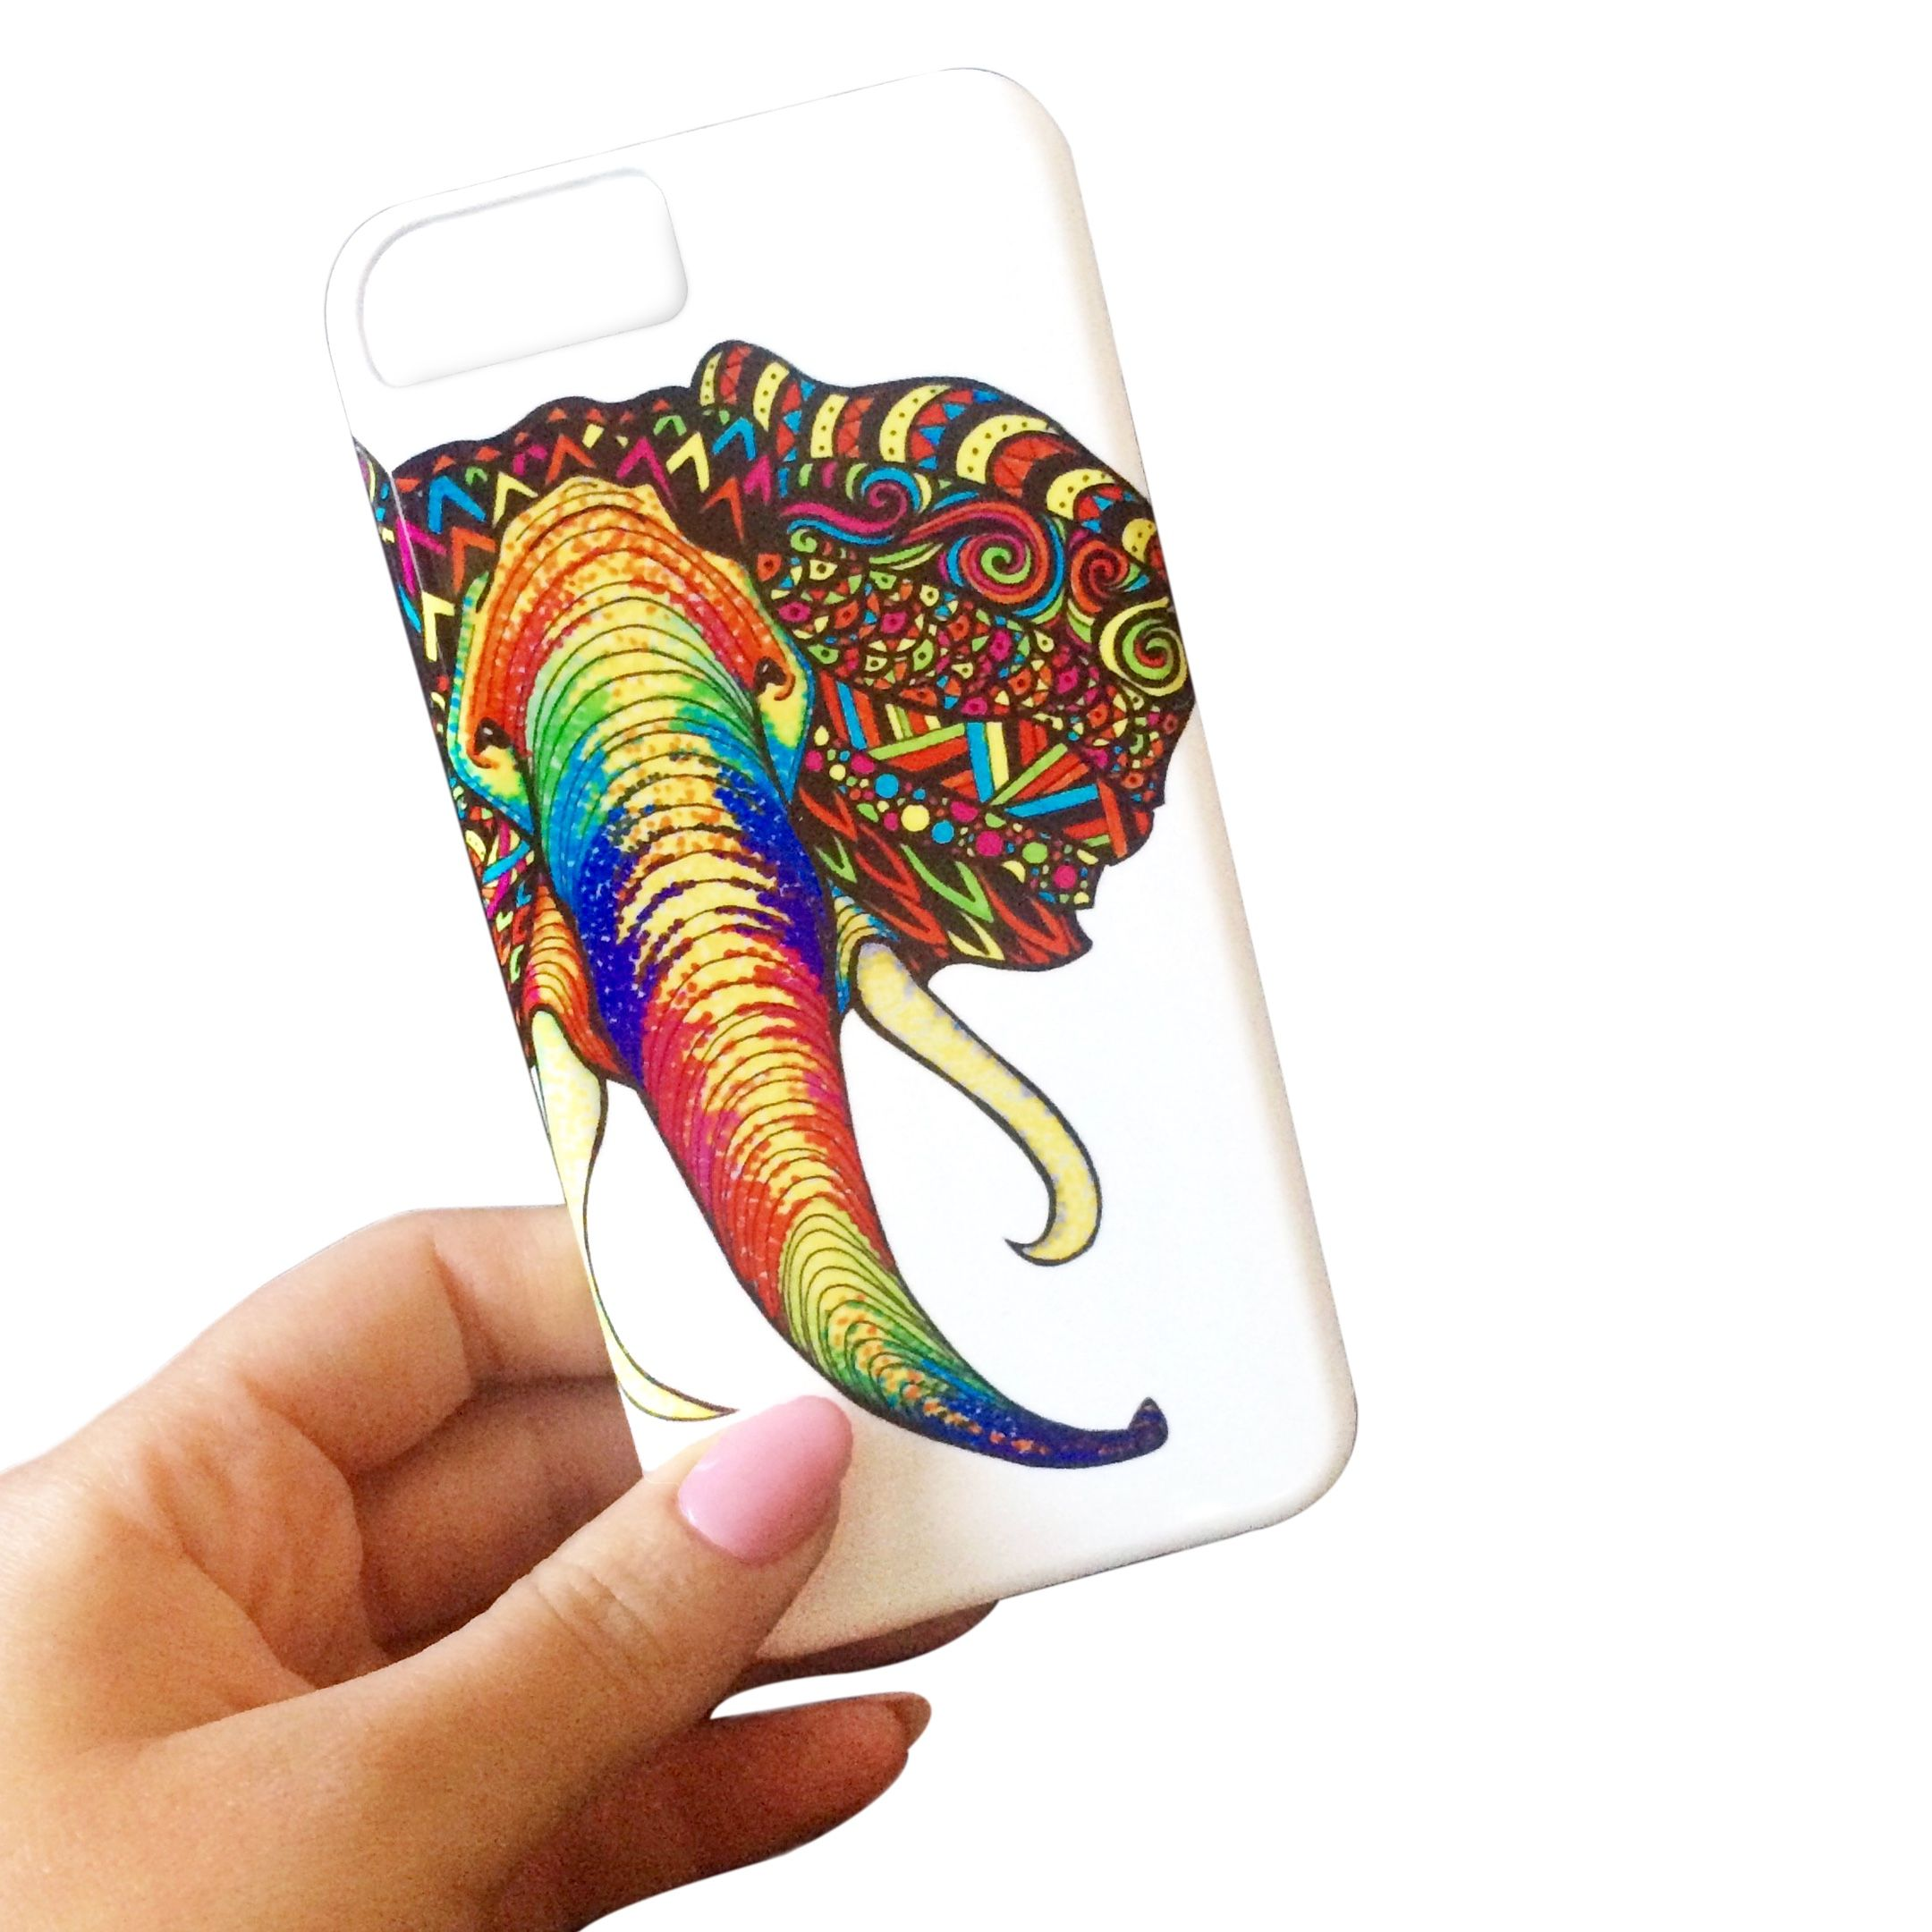 Www etradesupply com media uploaded iphone 5c vs iphone 5 screen jpg - Elephant Phone Case Iphone 6 6s Case Animal Phone Case Tribal Art